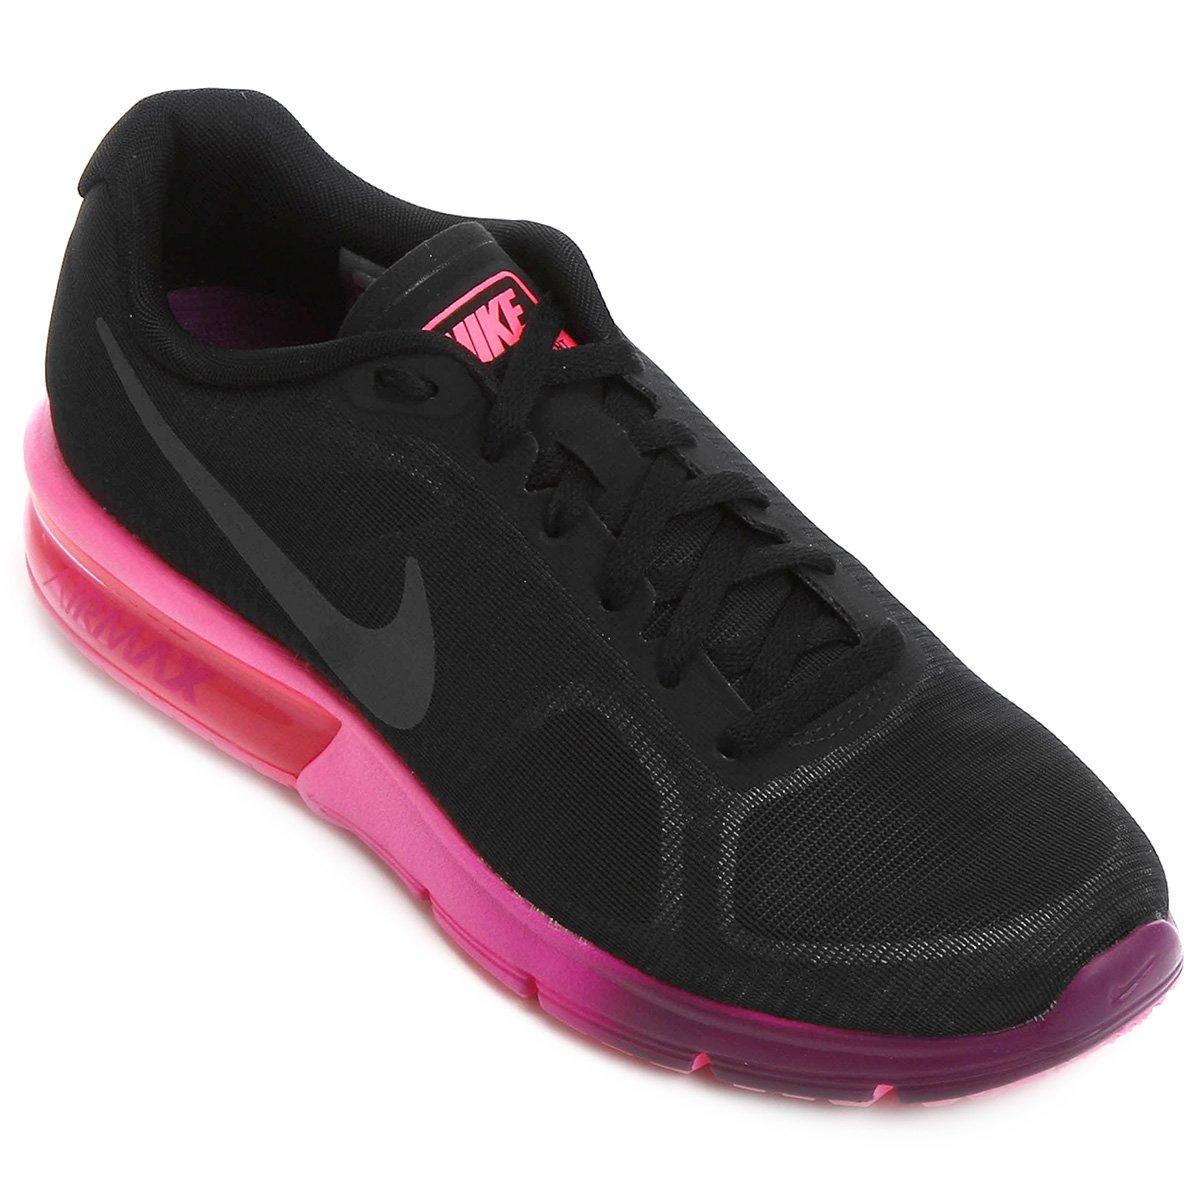 5f0bab7b5 Tenis Nike Feminino Casual Preto E Rosa - naturallycurlye.com